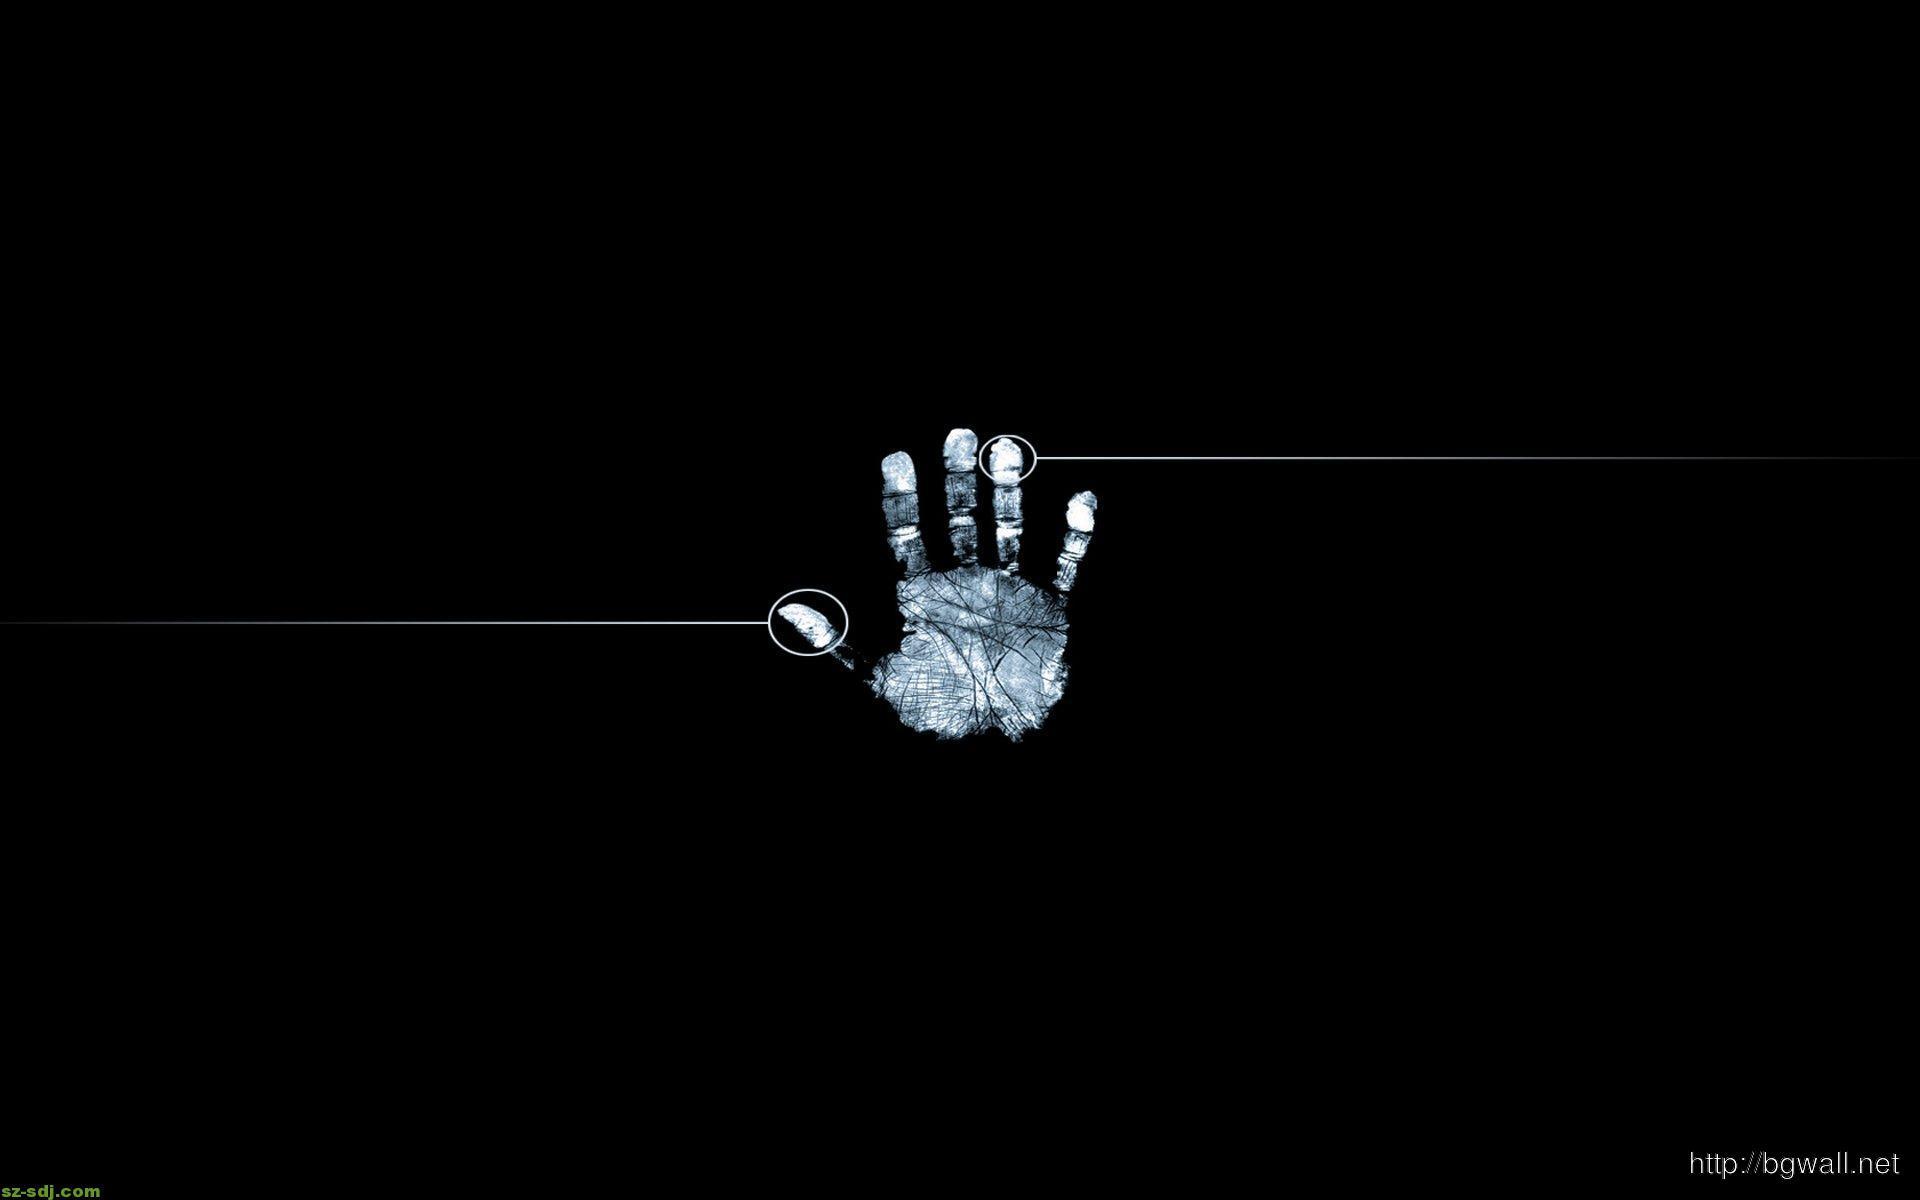 Best Hq Hand Finger Print Image Wallpaper Background Wallpaper HD